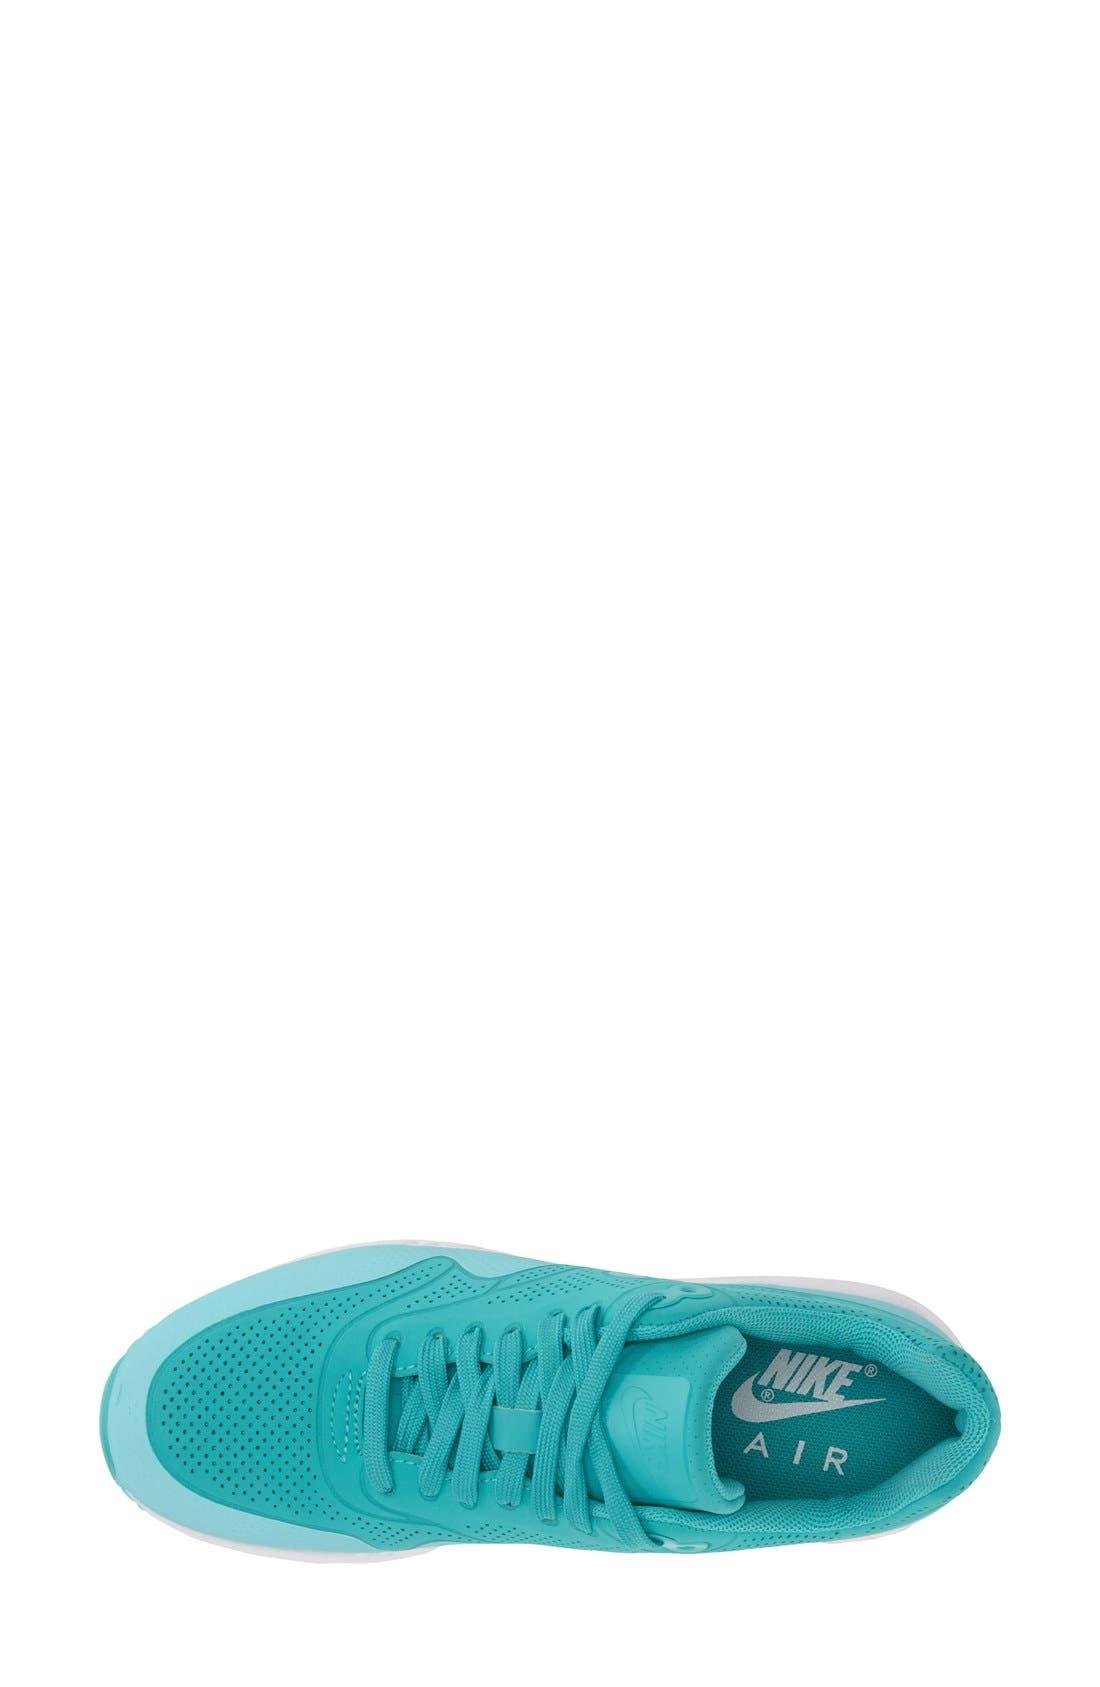 ,                             'Air Max 1 - Ultra Moire' Sneaker,                             Alternate thumbnail 70, color,                             401